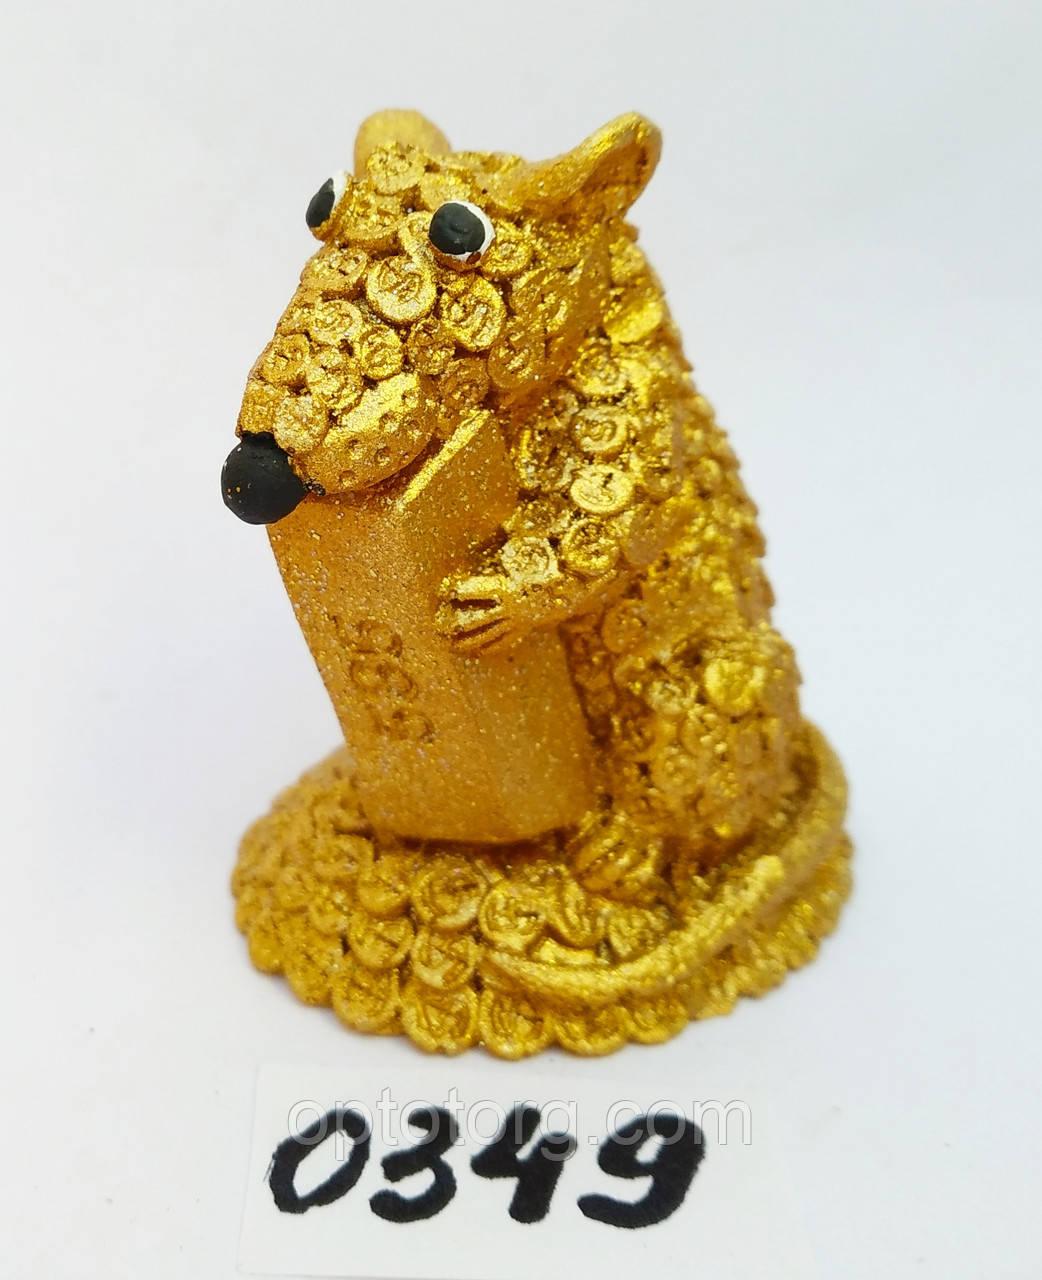 Сувенир статуэтка Символ года 2020 размер 6*4*5,5 см